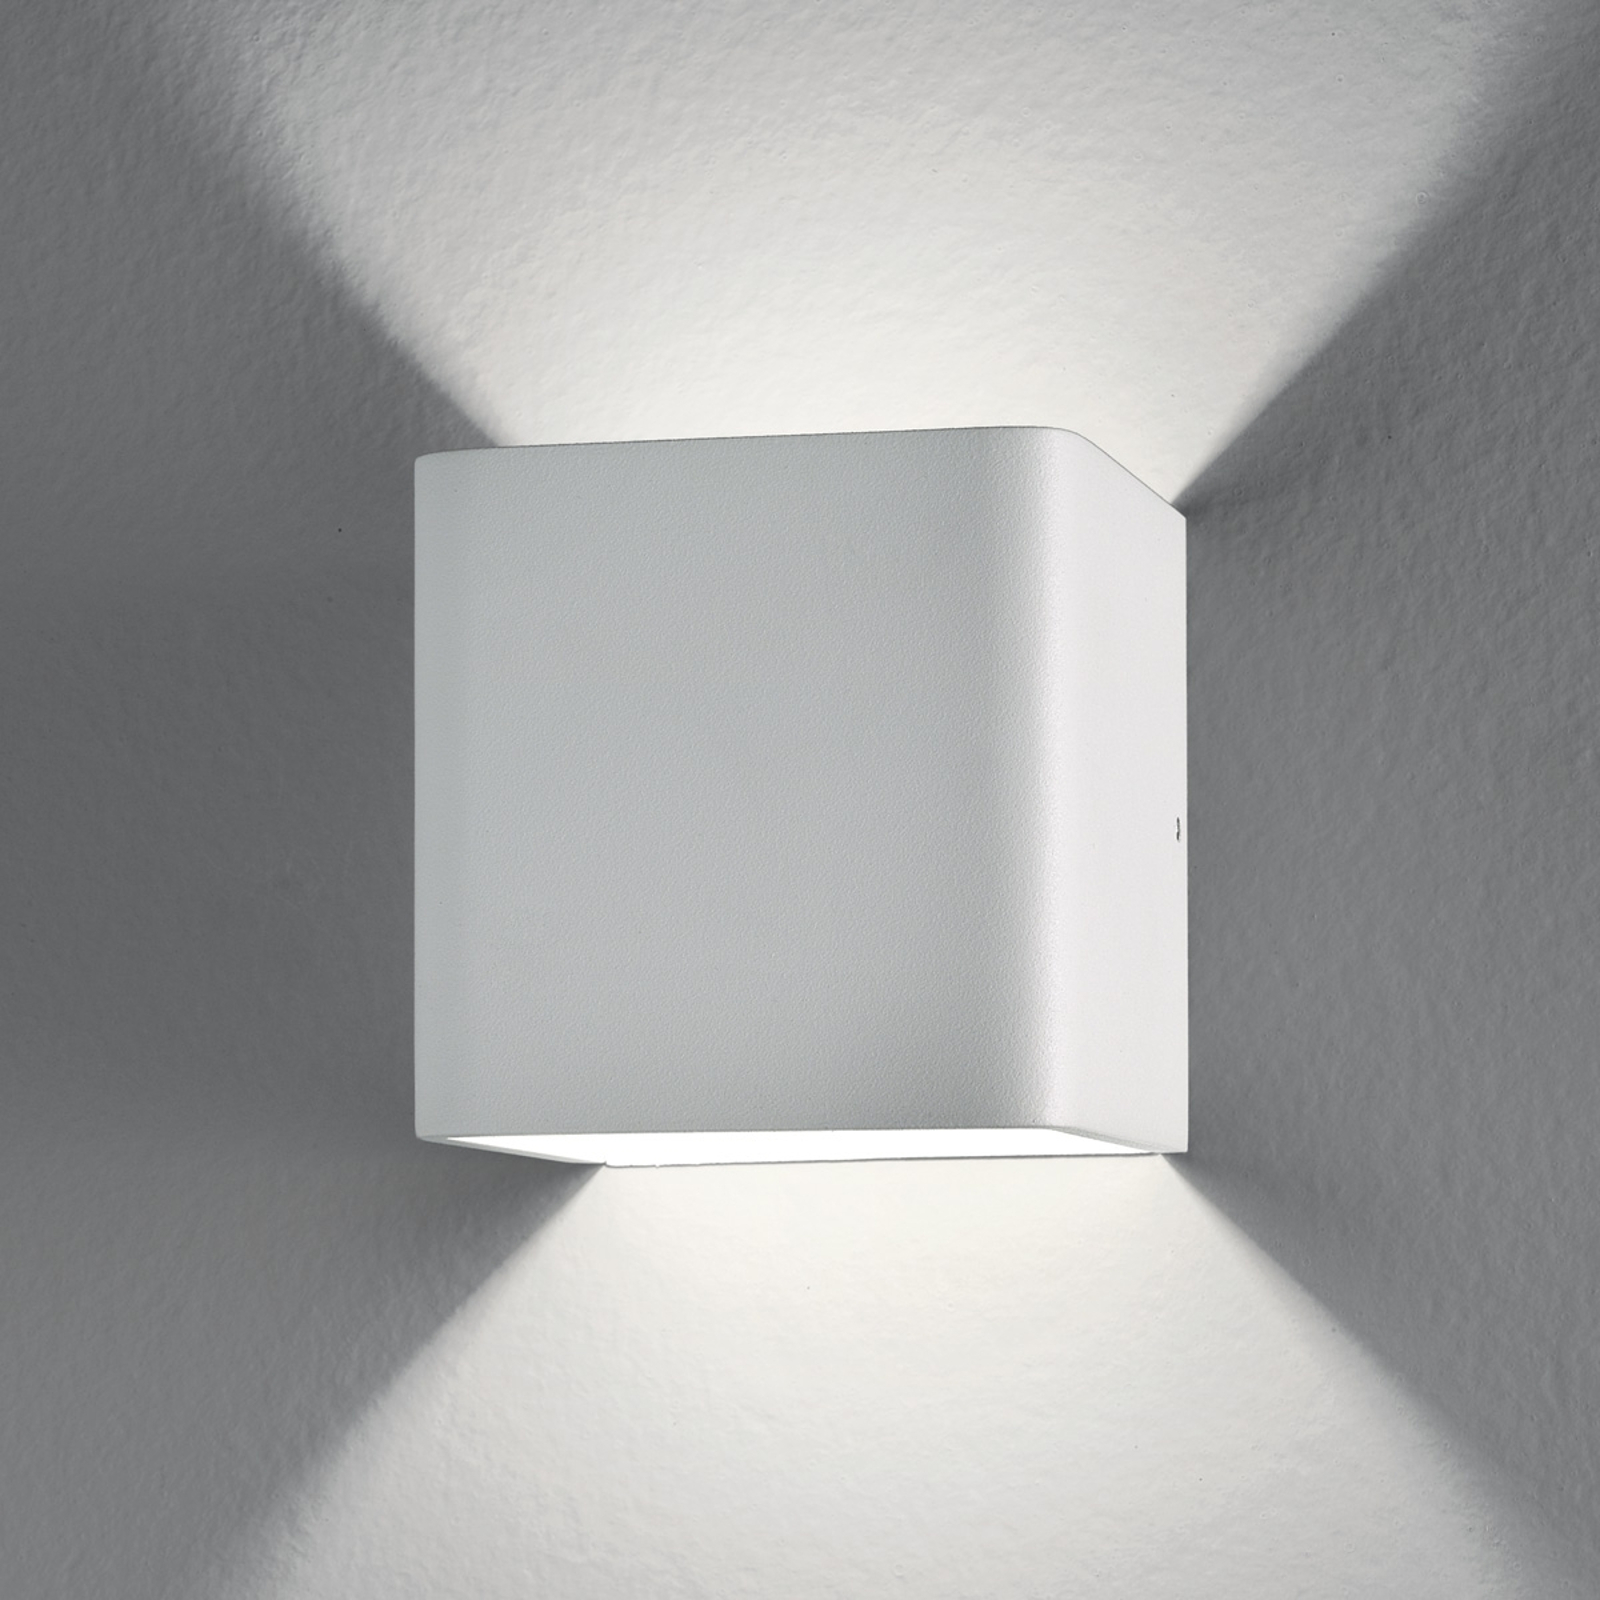 Applique LED Gino cubique, 6W